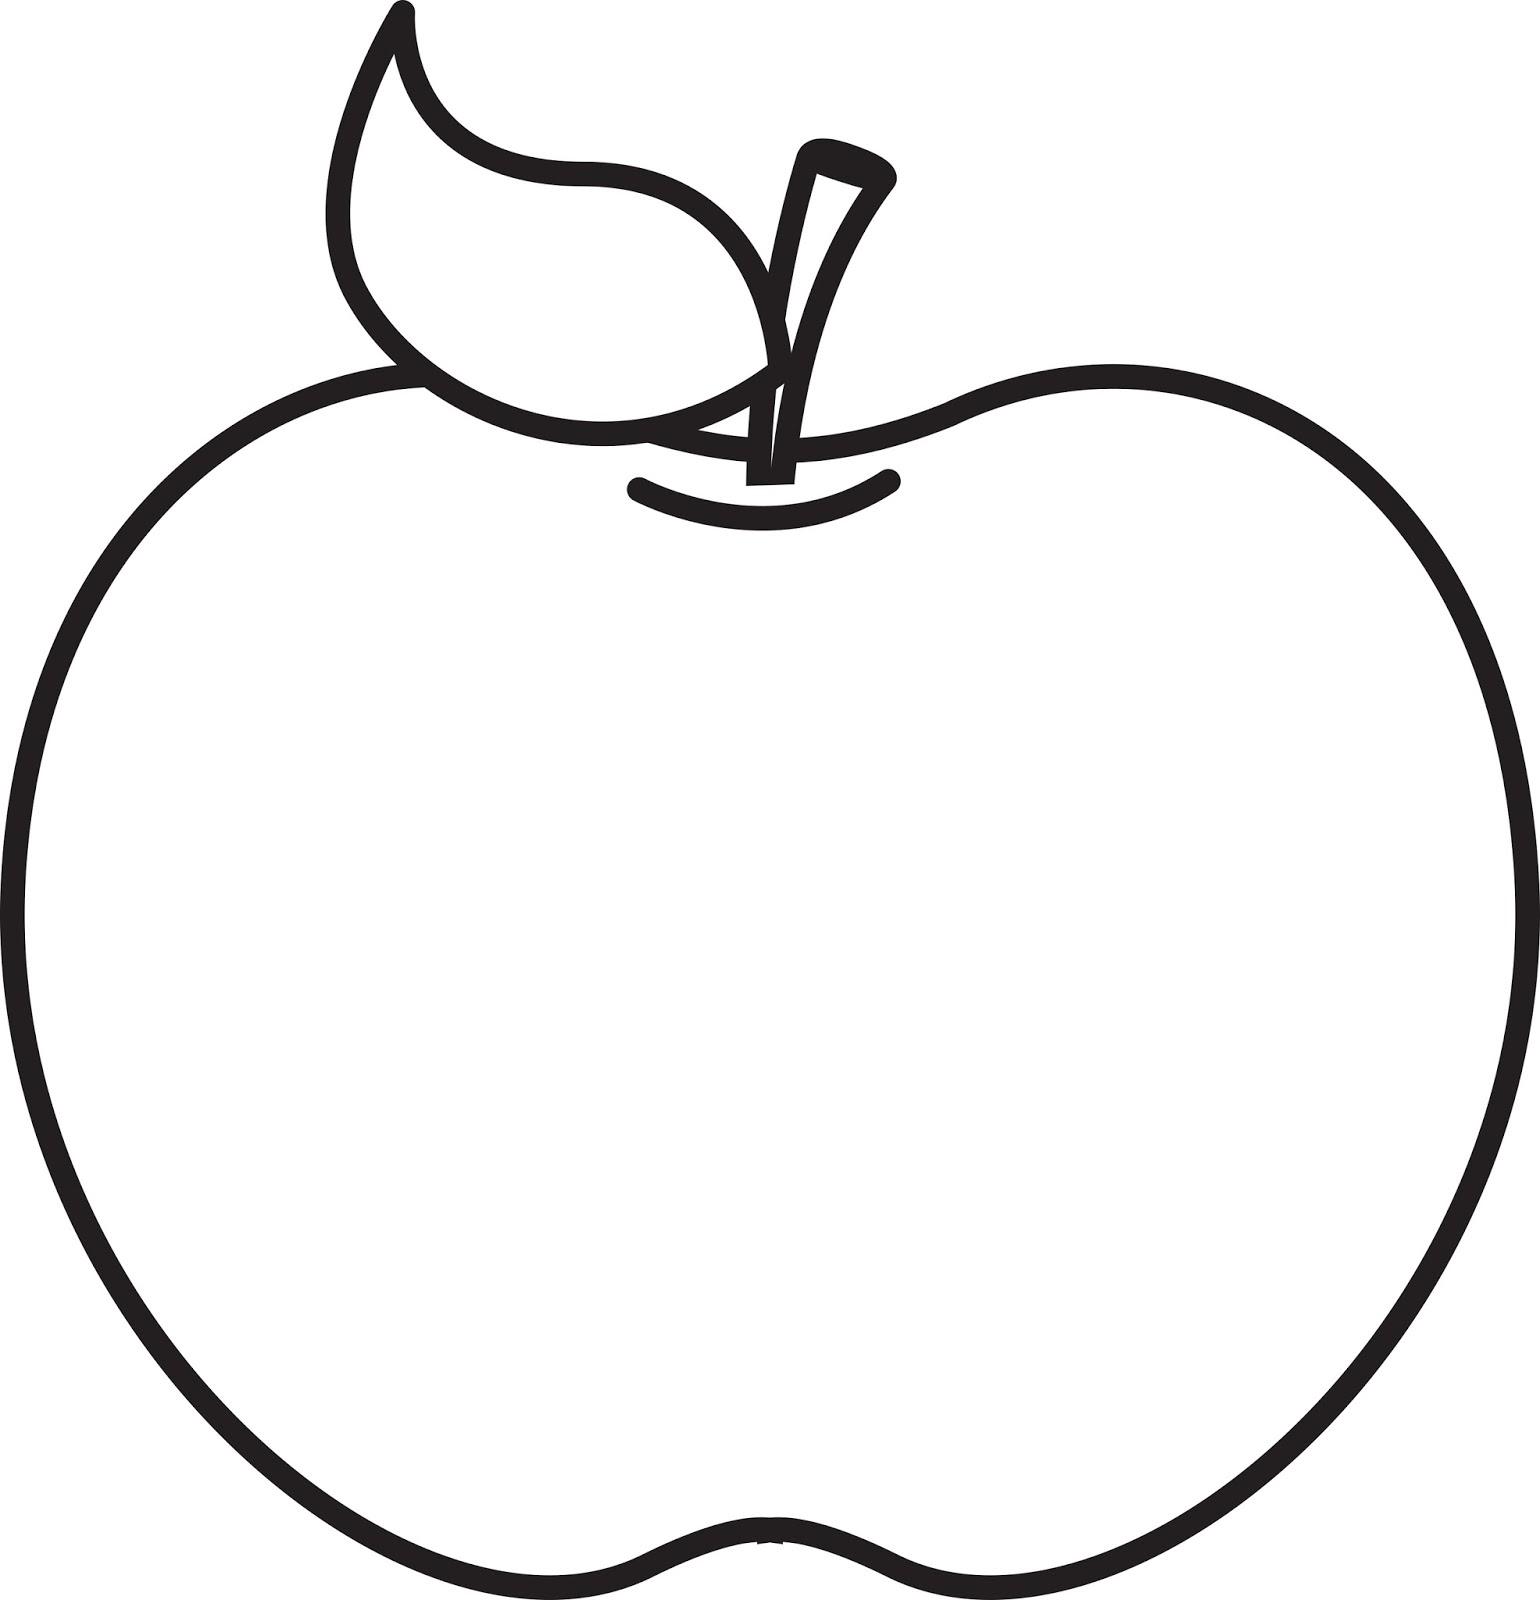 1540x1600 Apple black white black and white apple clipart clip art